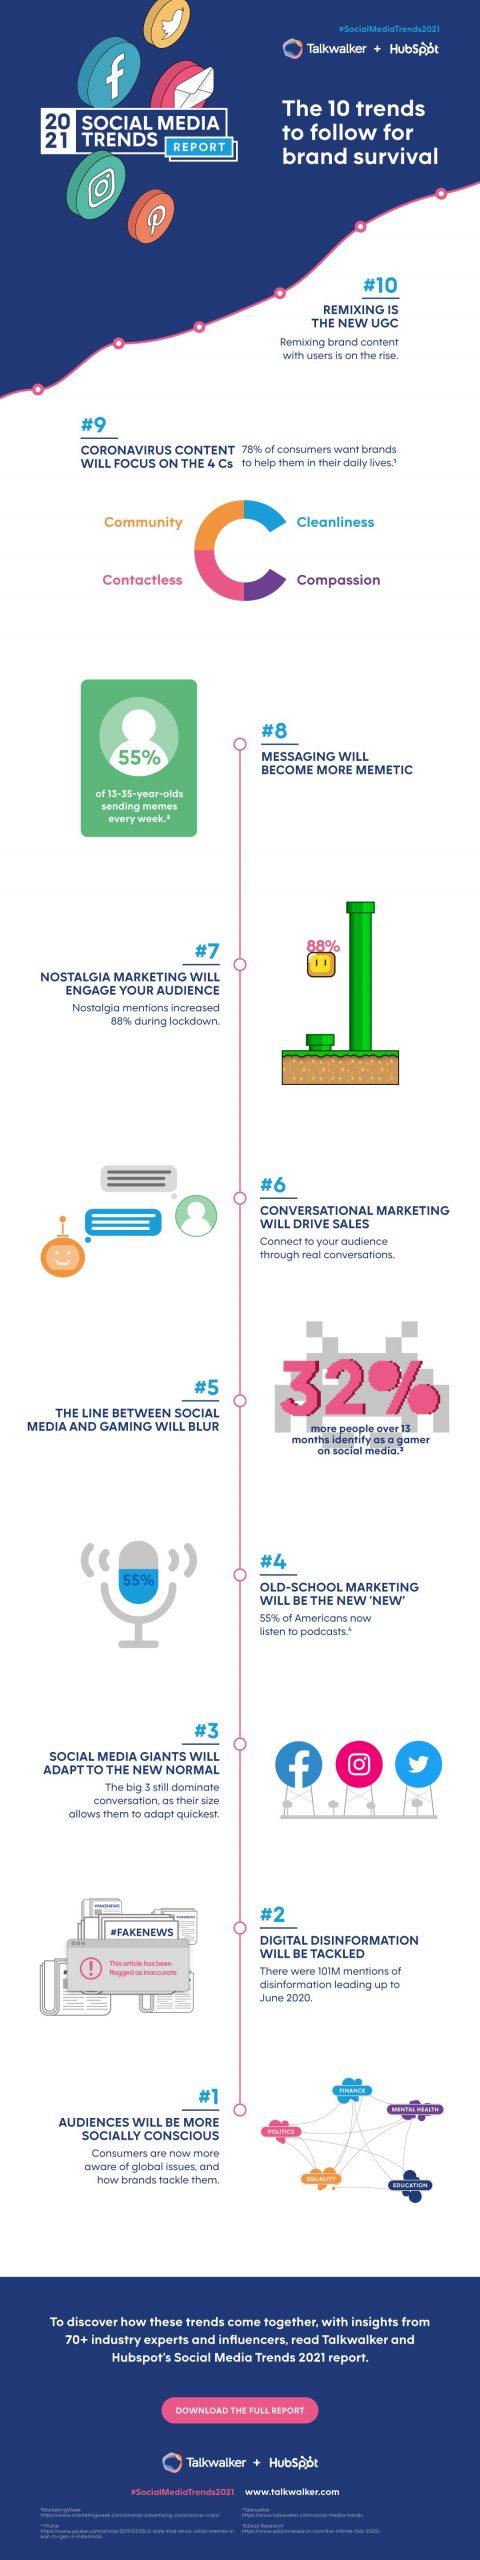 Talkwalker Social Media Trends 2021 Report - infographic